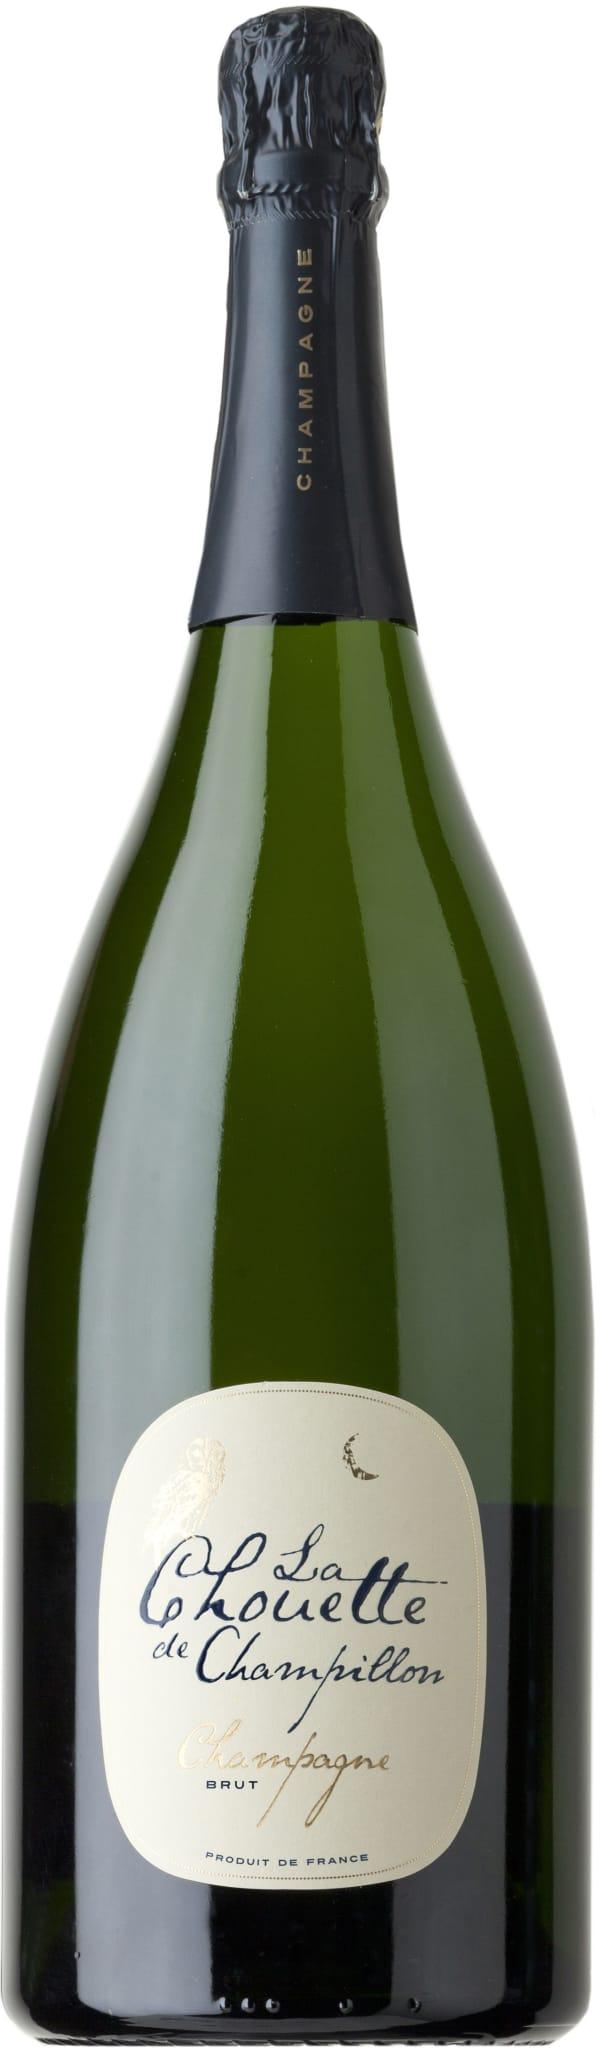 La Chouette de Champillon Magnum Champagne Brut